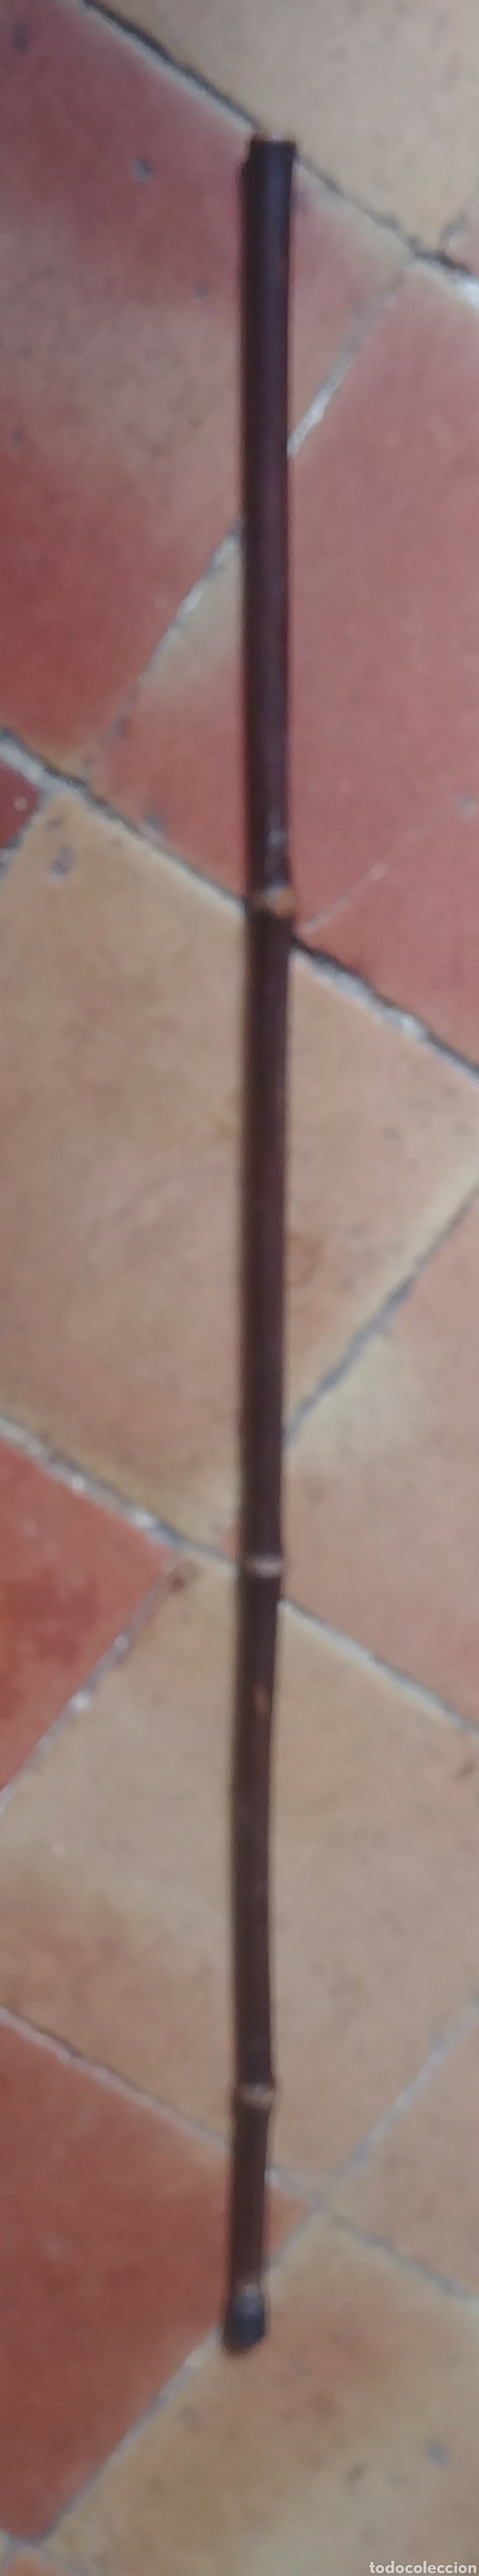 Antigüedades: Baston bambú s xix. - Foto 3 - 113091956